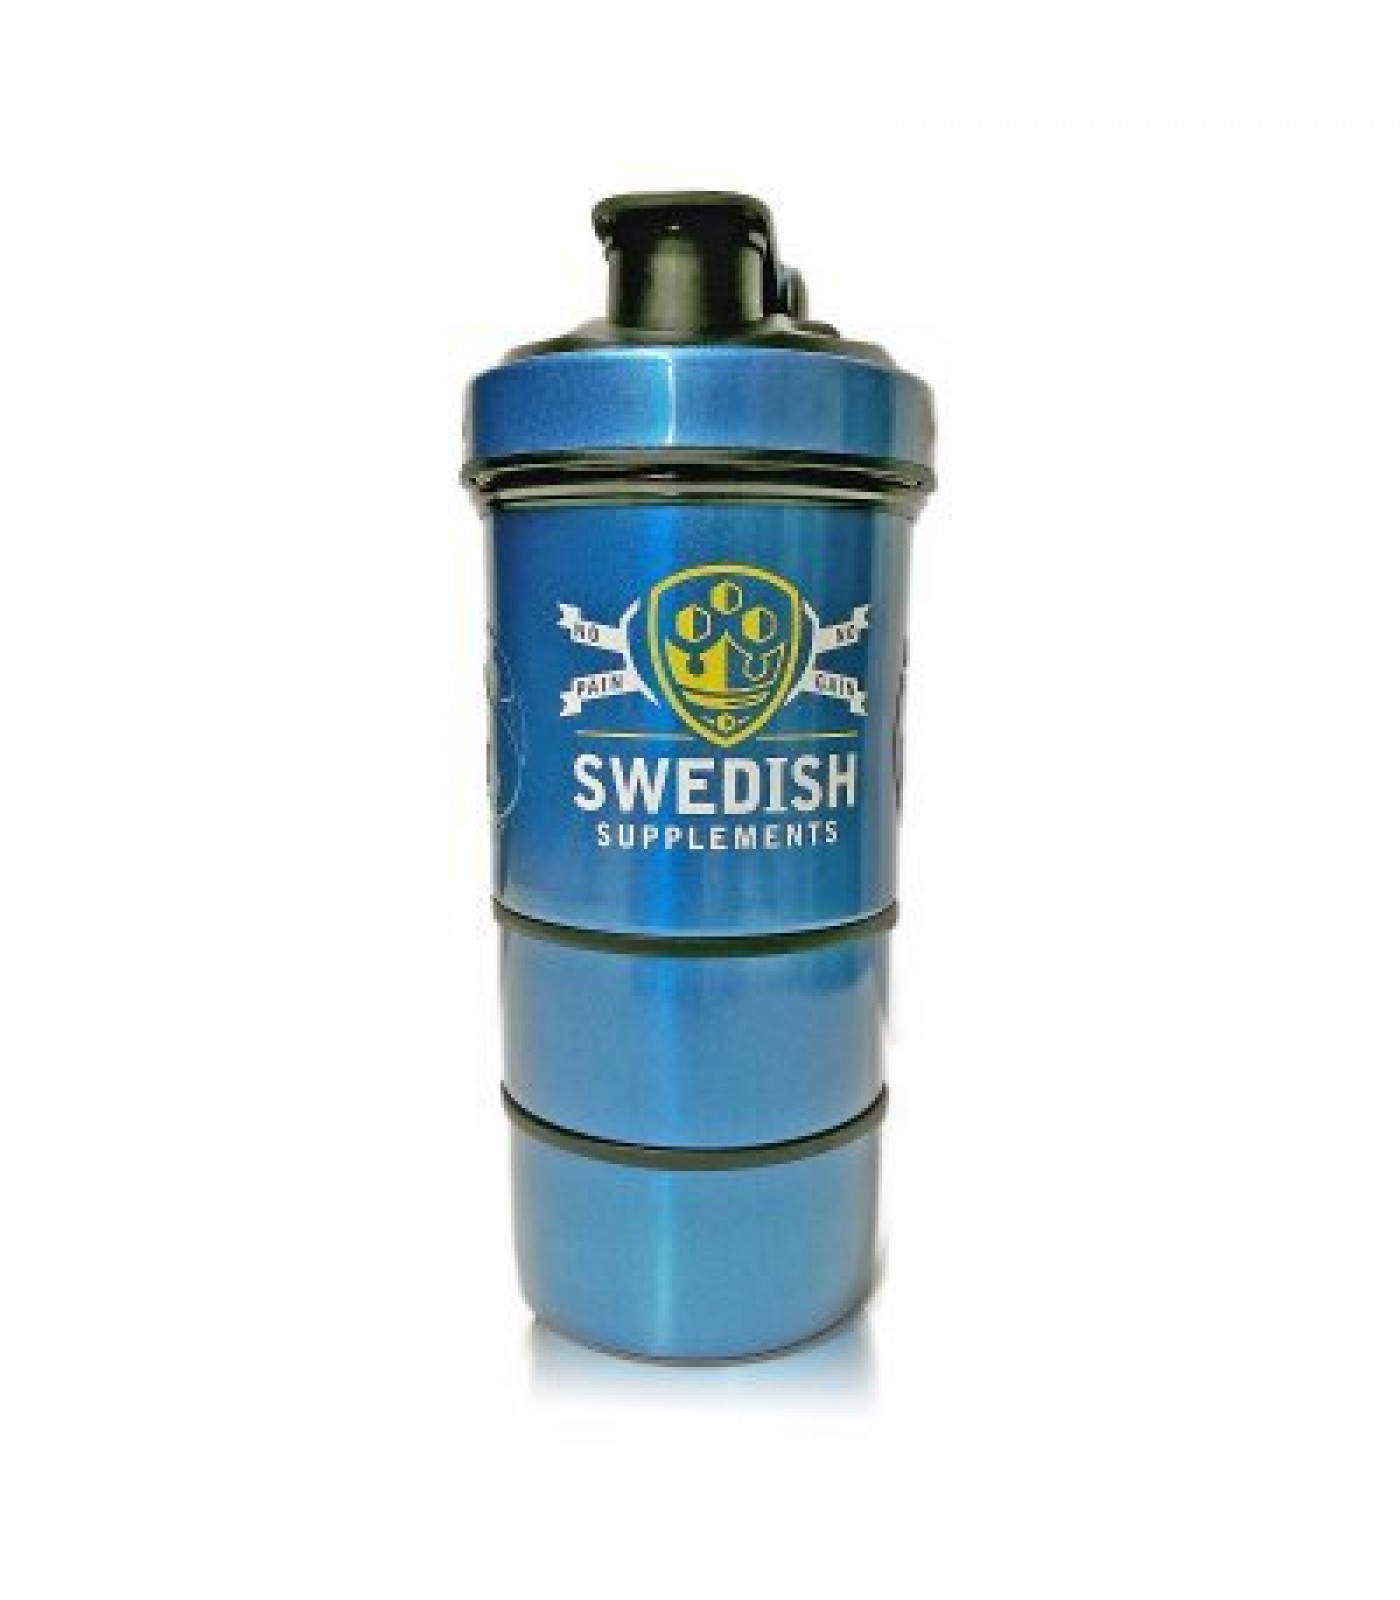 SWEDISH Supplements - Metal Shaker / SWEDISH Smart Shaker with Ice Puck